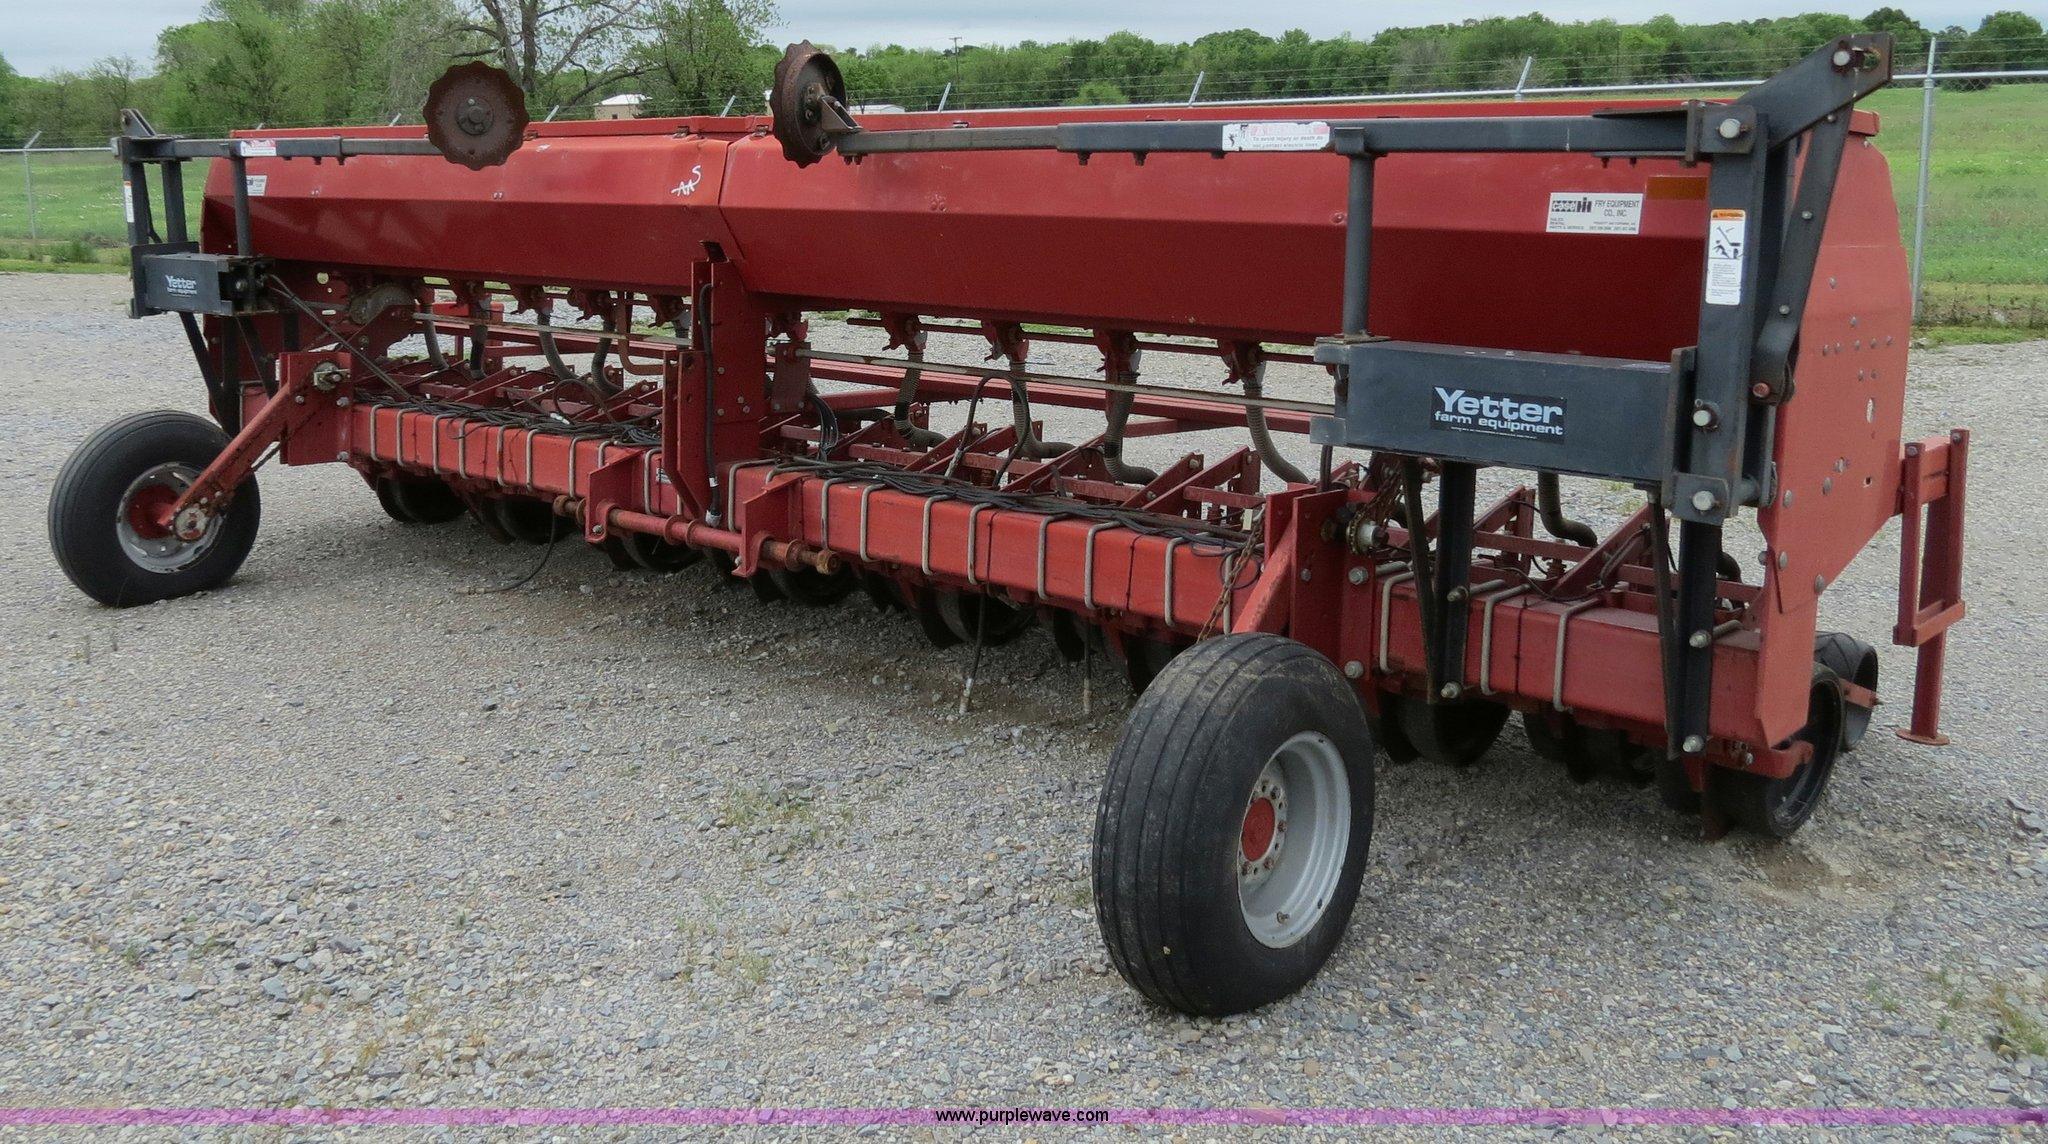 1995 case ih 5400 20 soybean special drill item b2273 s rh purplewave com Case Grain Drill Parts IH 5100 Grain Drill